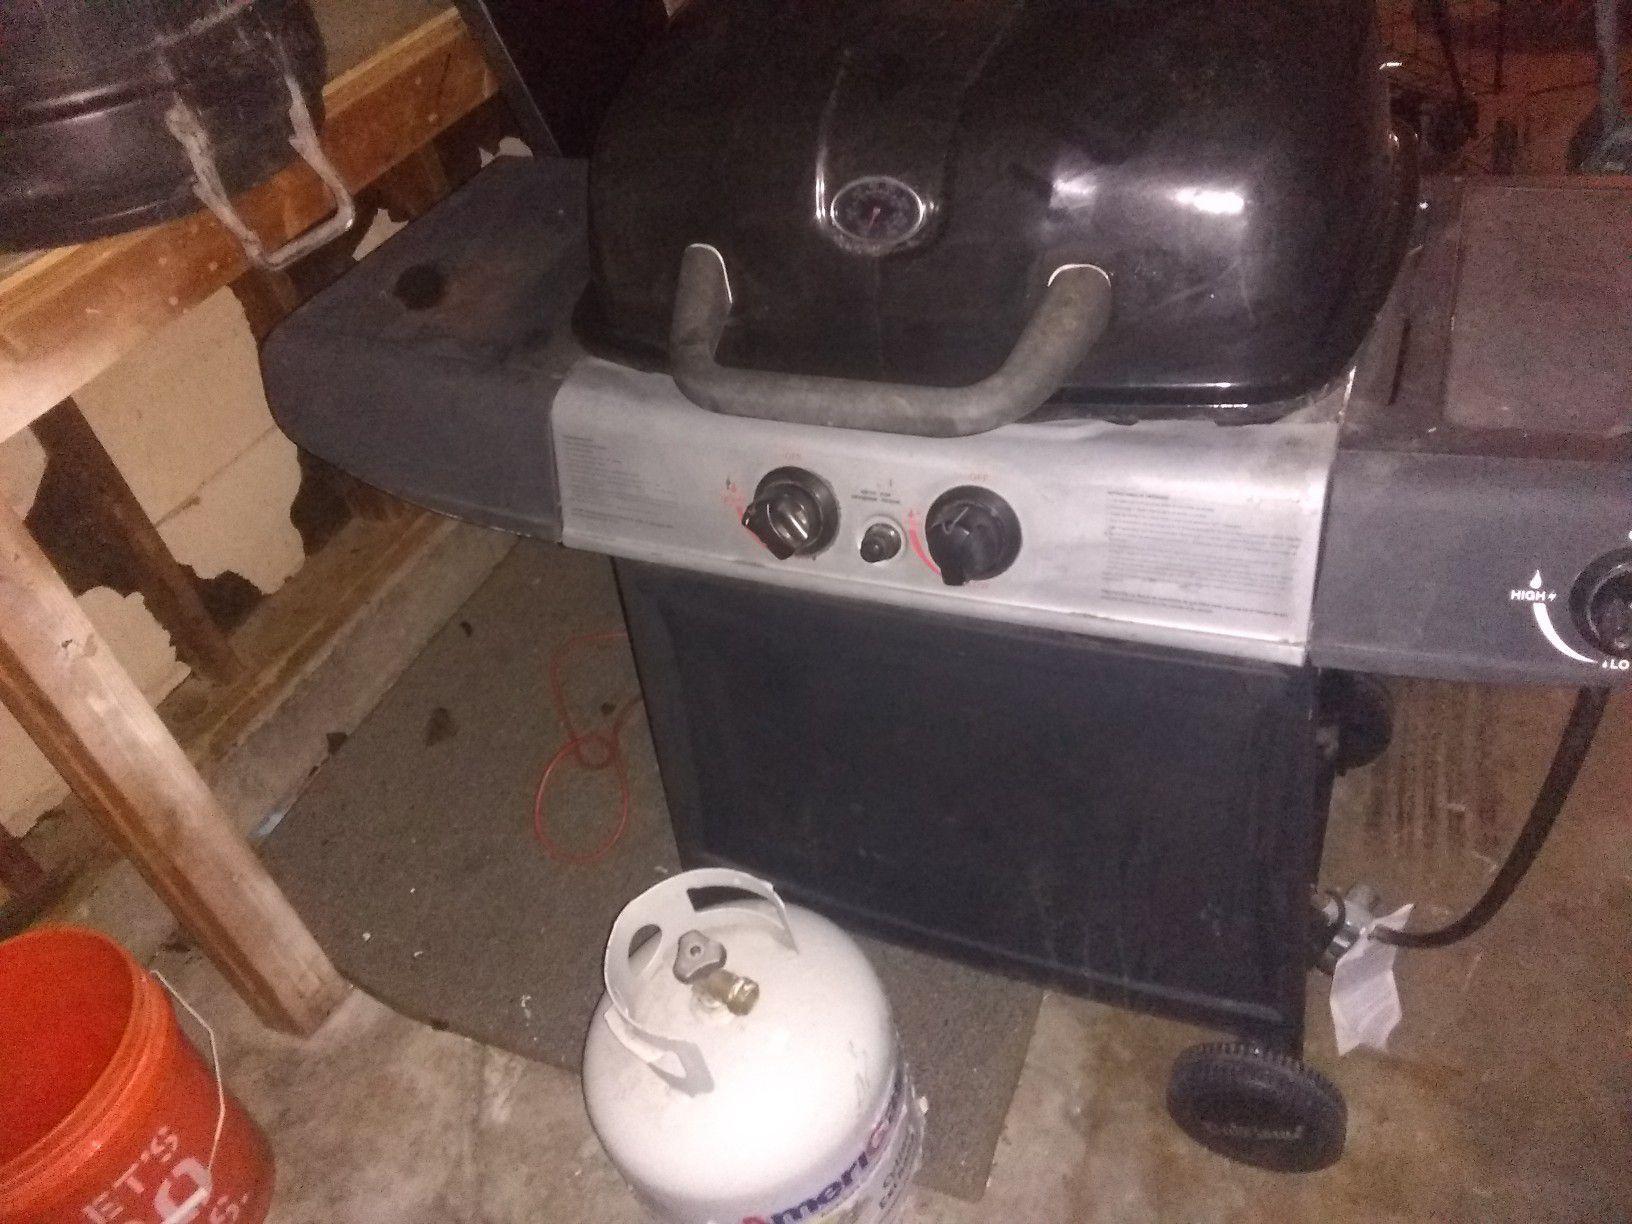 BBQ with propane tank